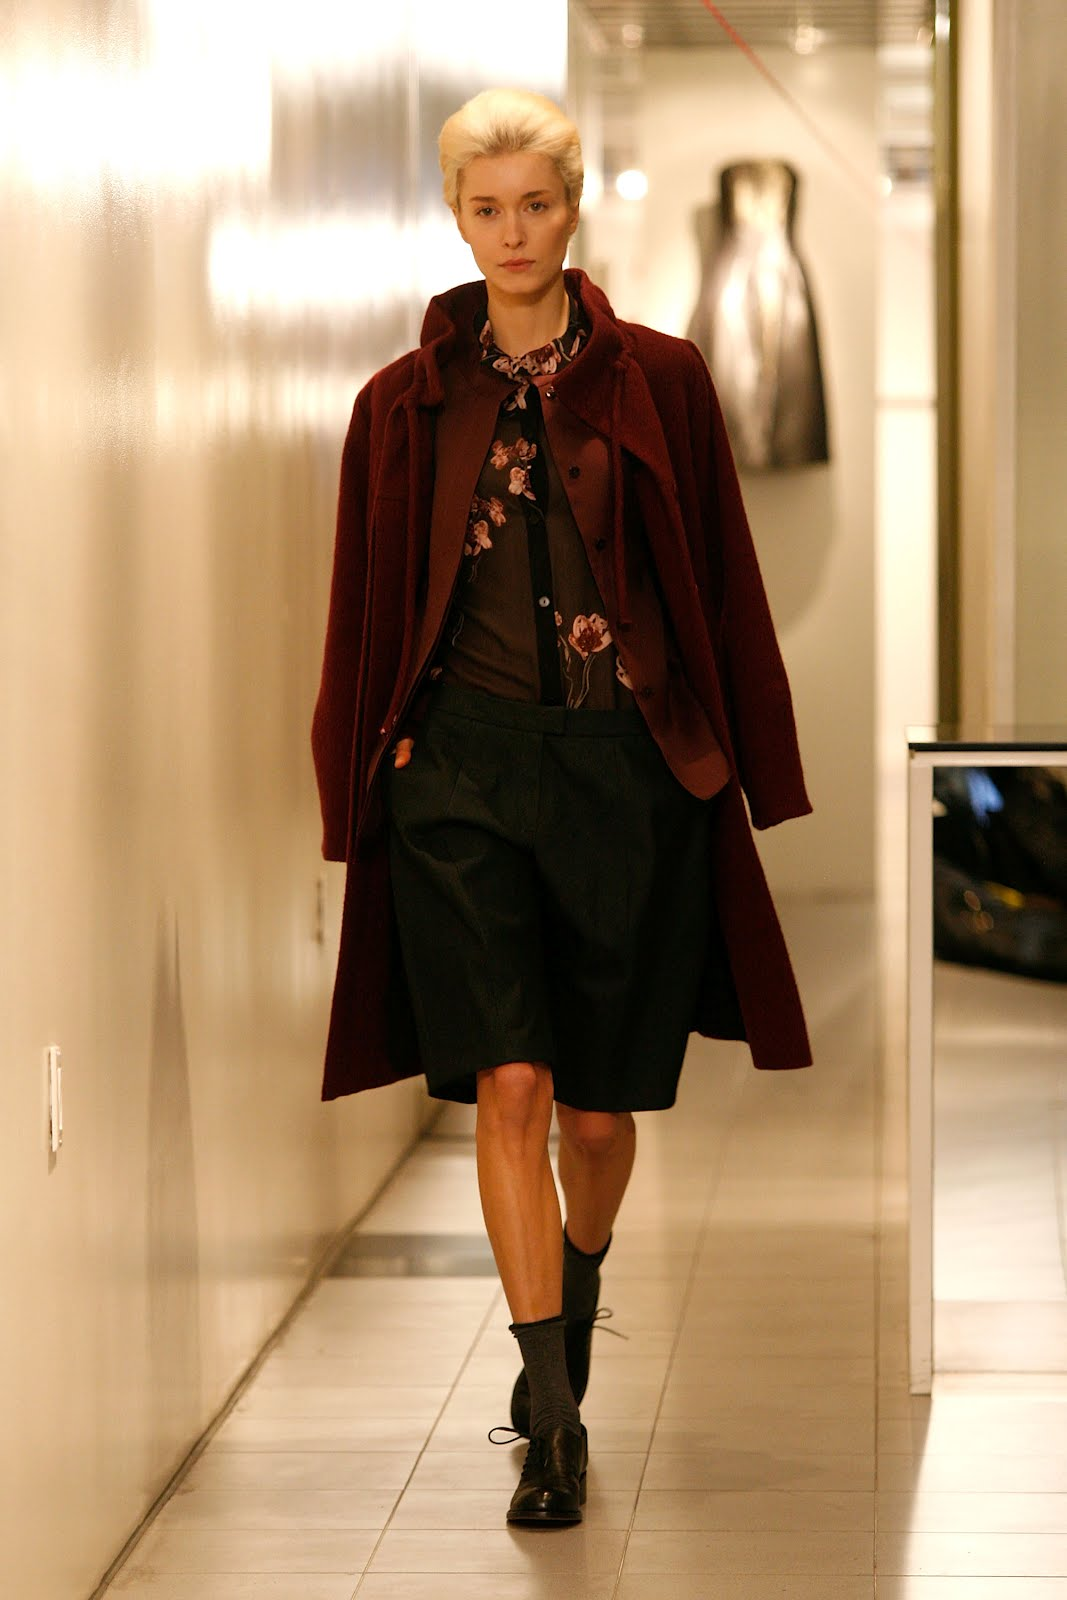 Bruno Basso Fashion Designer